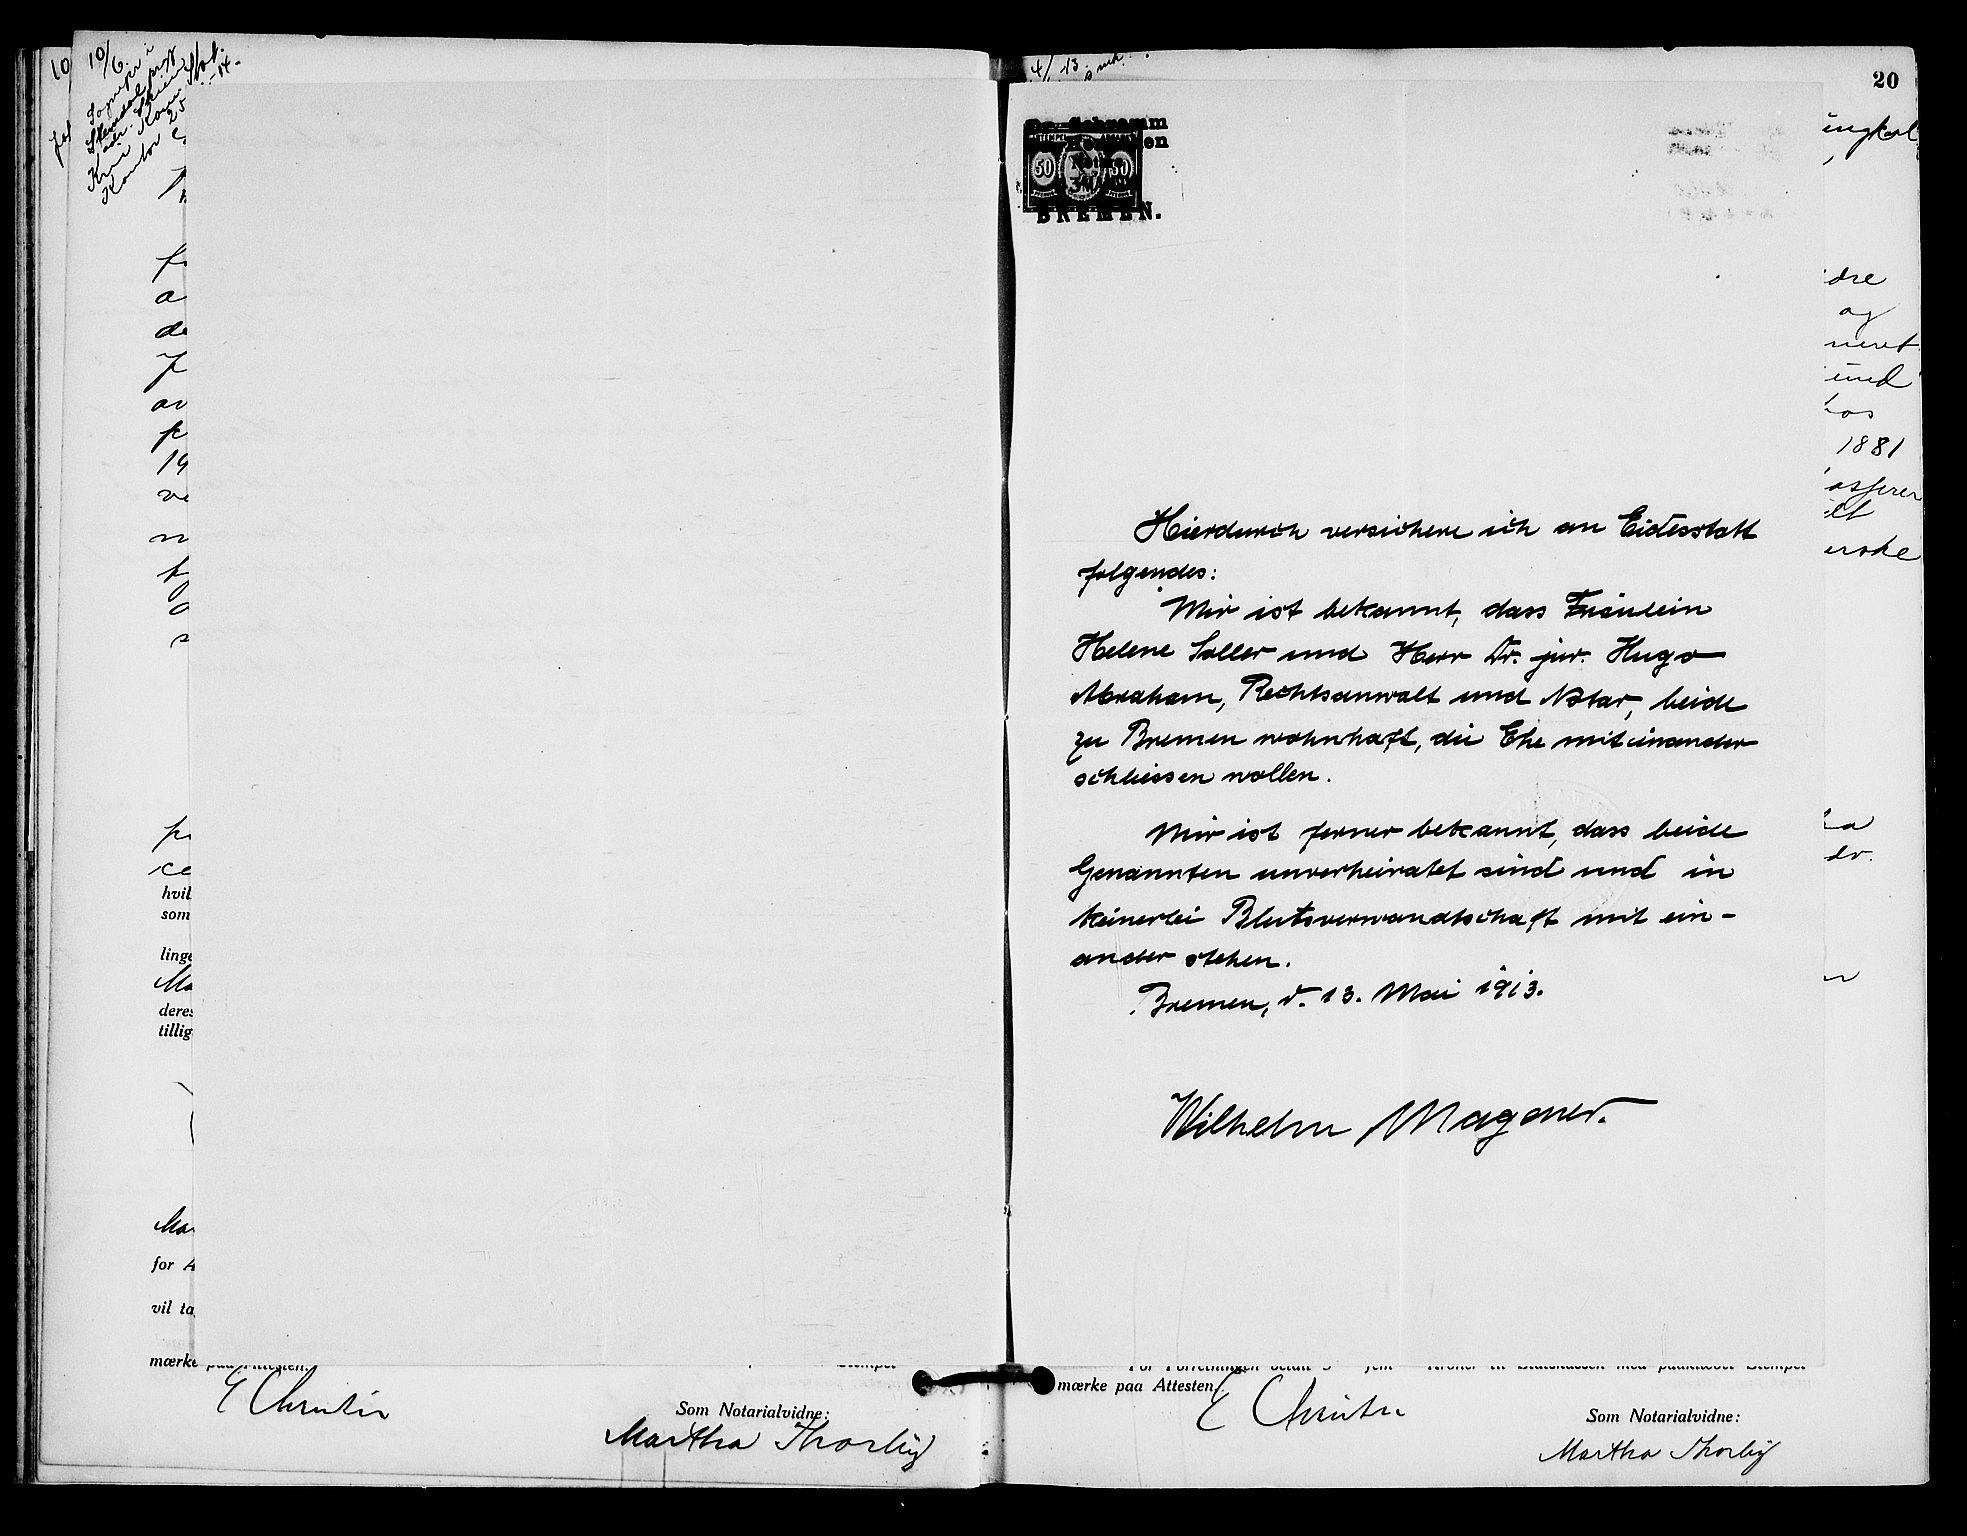 SAO, Oslo byfogd avd. I, L/Lb/Lbb/L0009: Notarialprotokoll, rekke II: Vigsler, 1913-1914, s. 19b-20a